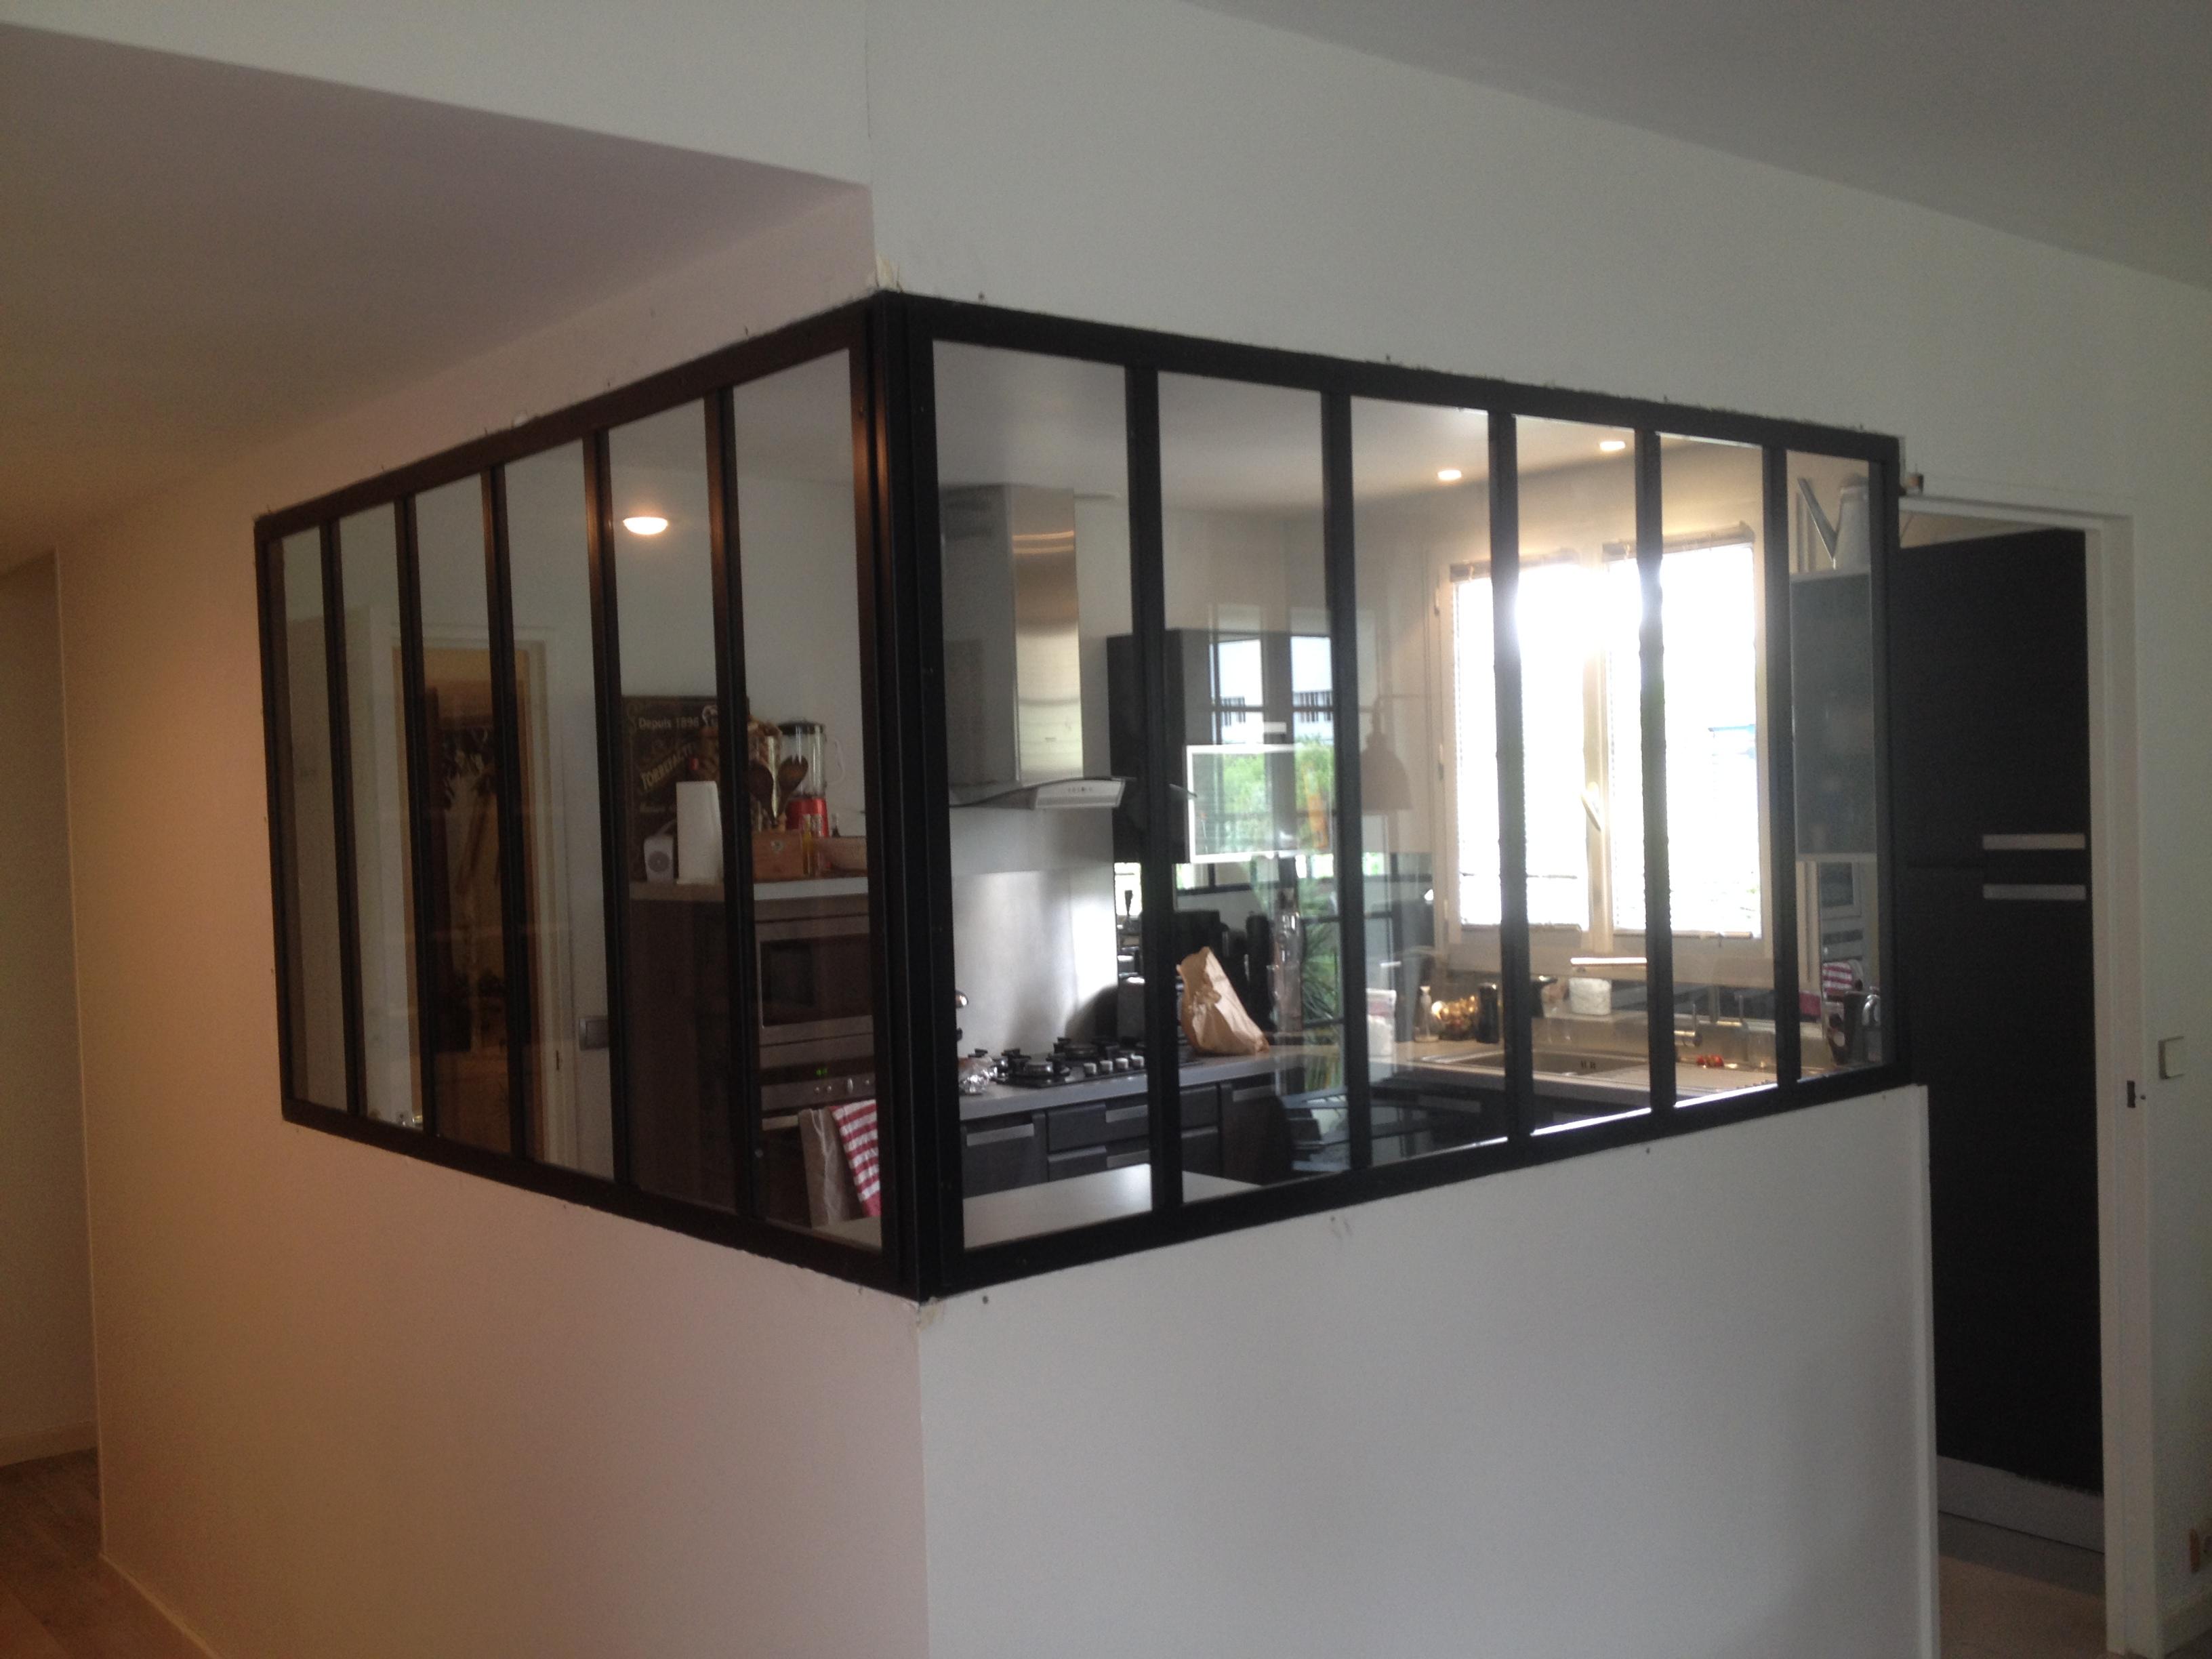 verri re type atelier d 39 artiste rambouillet la rambolitaine. Black Bedroom Furniture Sets. Home Design Ideas